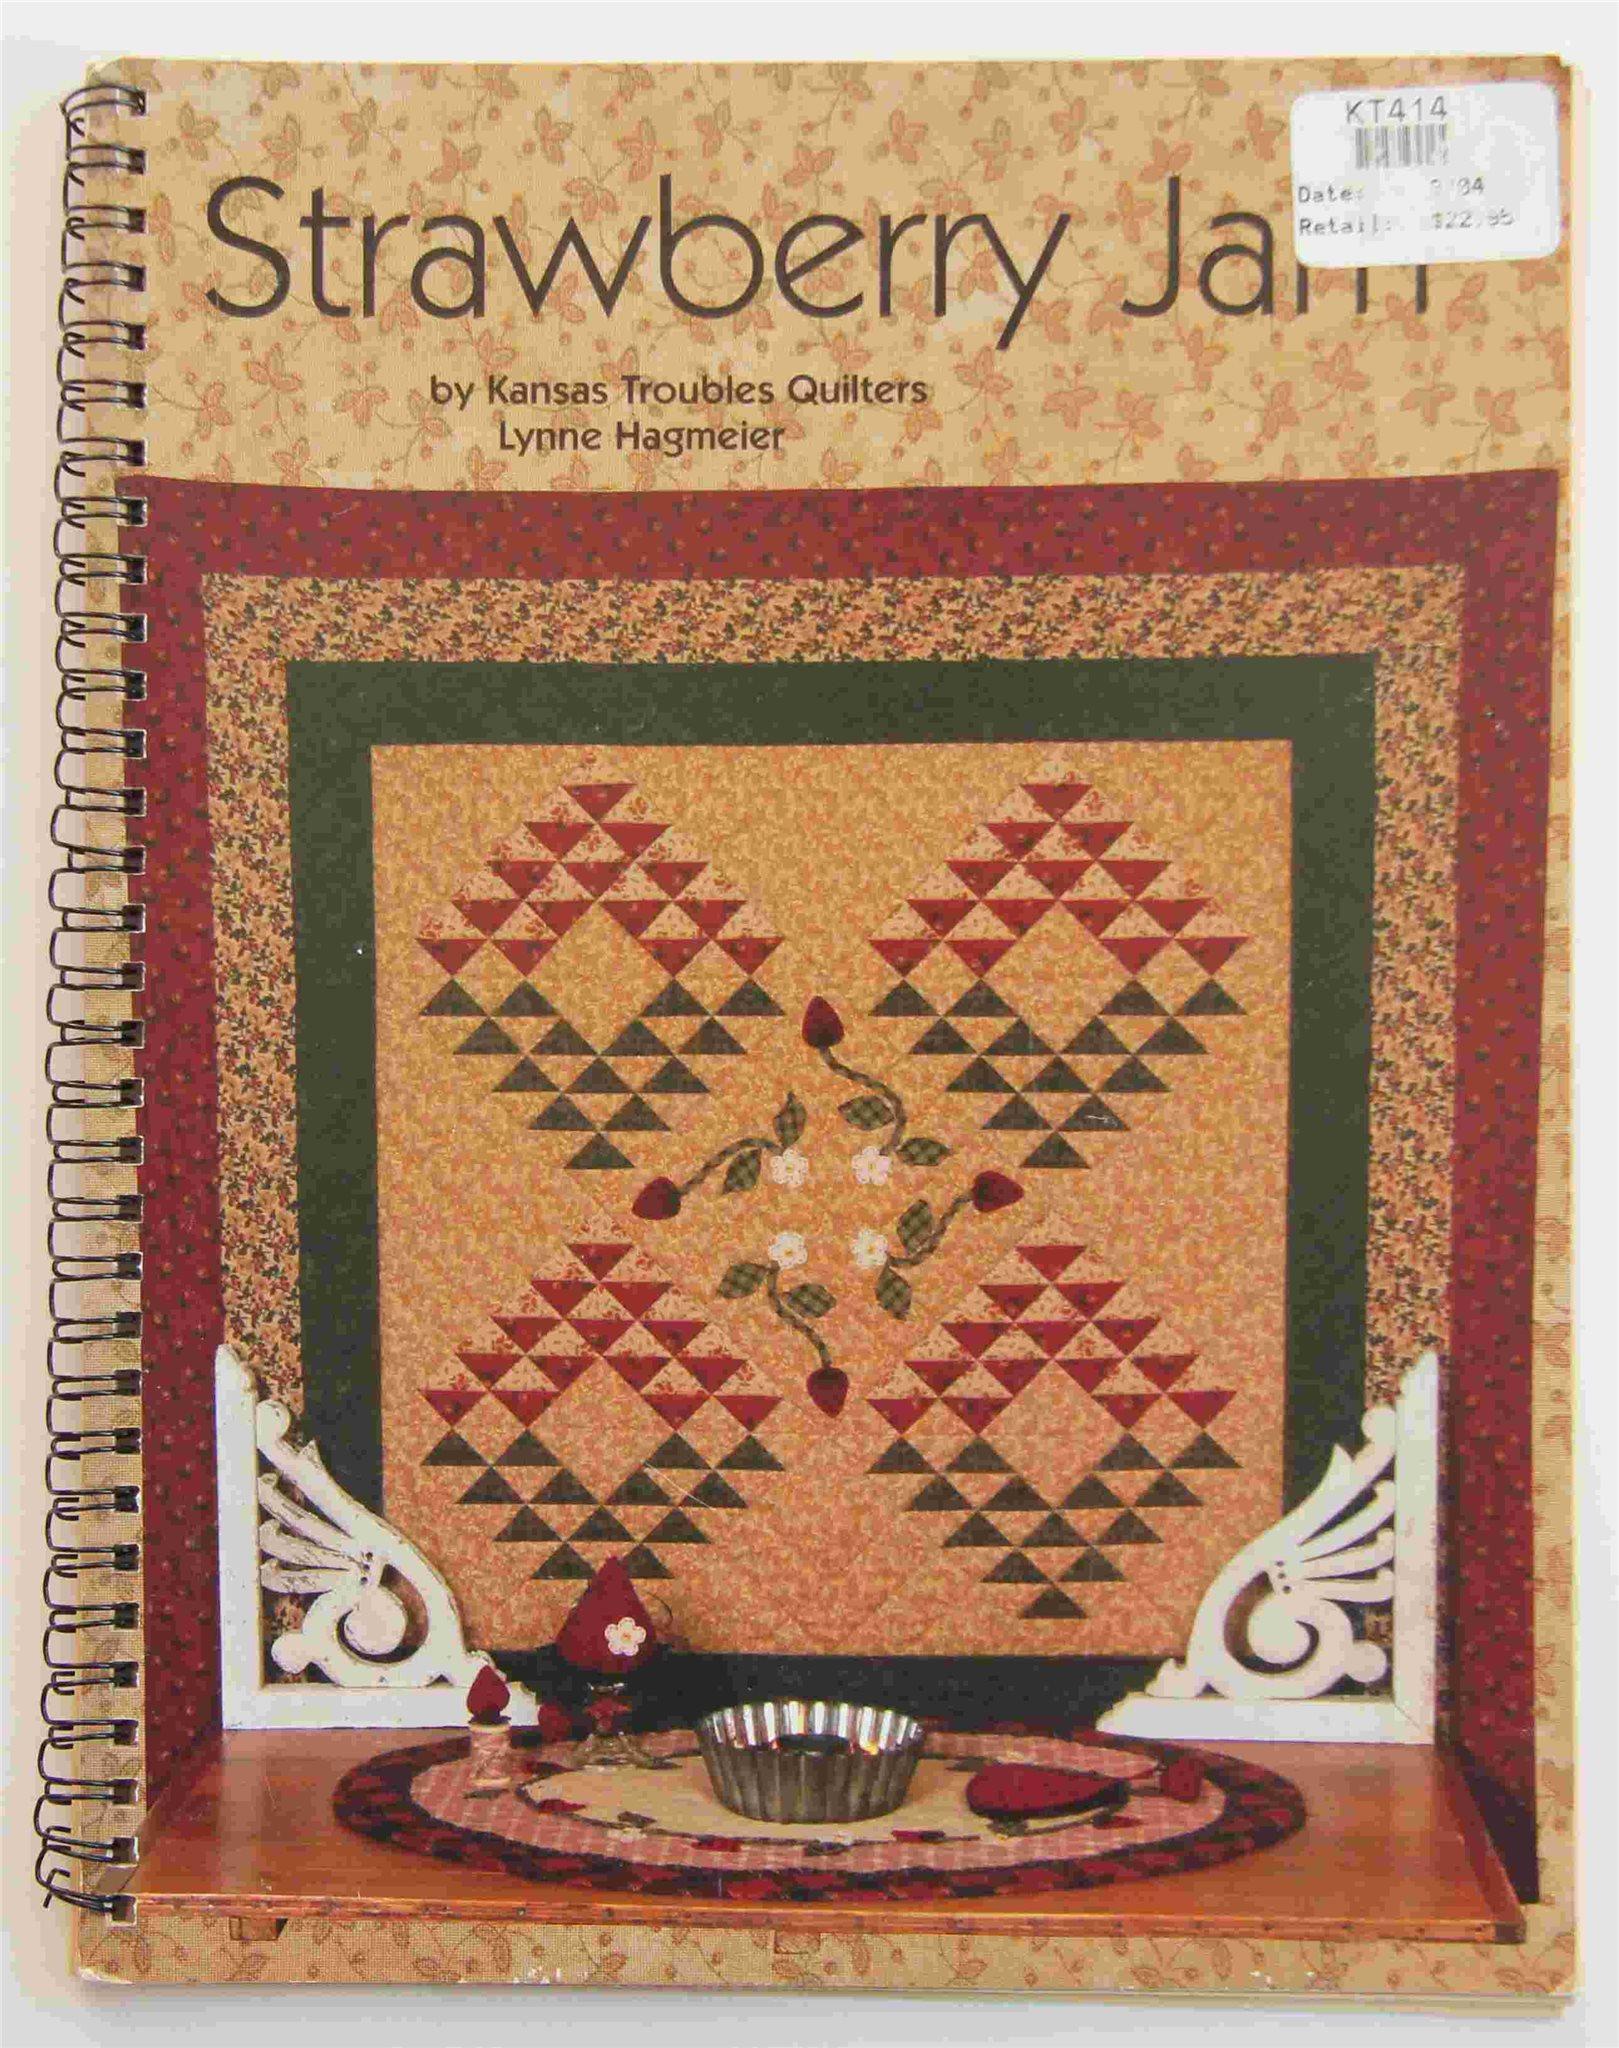 Strawberry Jam - (bok om quiltning)